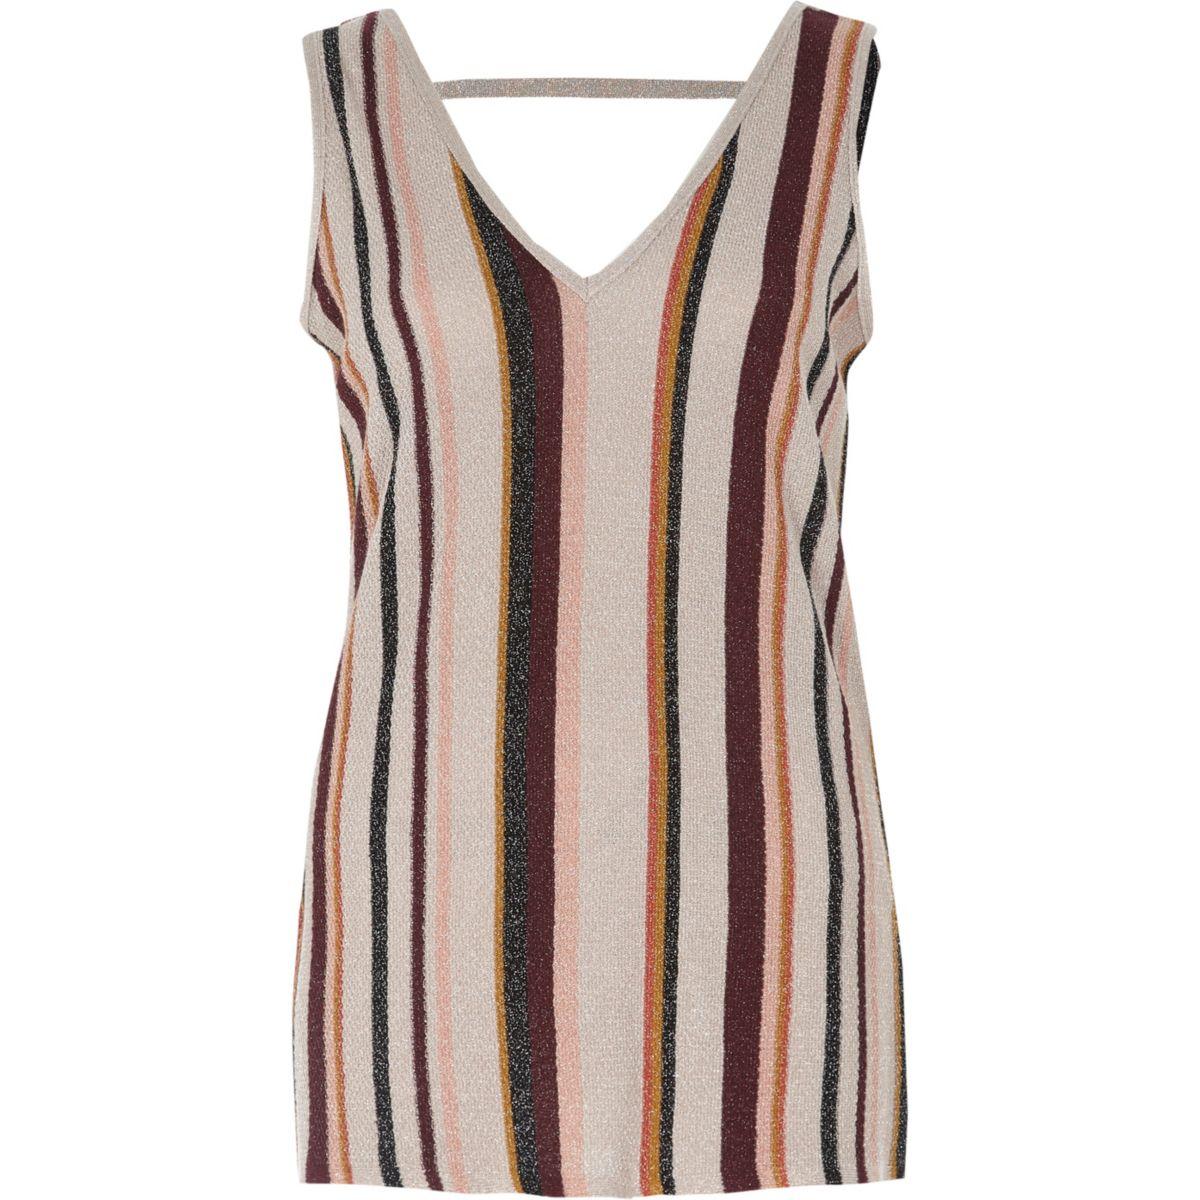 Light vest pink stripe metallic knit stitch BxBf6Uwq